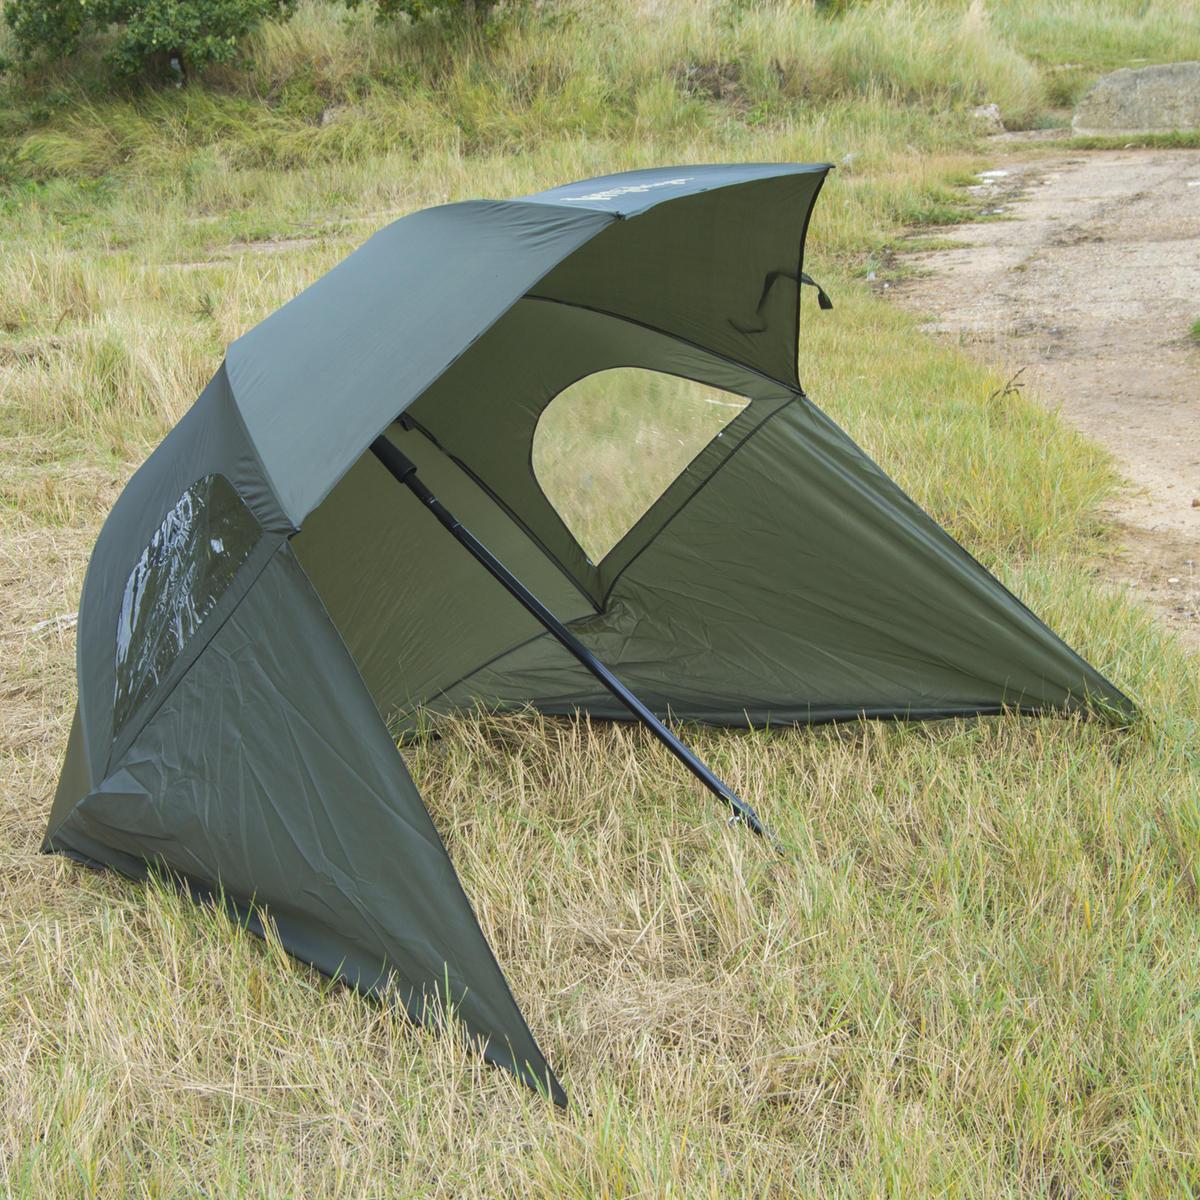 Botswana free shelter delivering help support